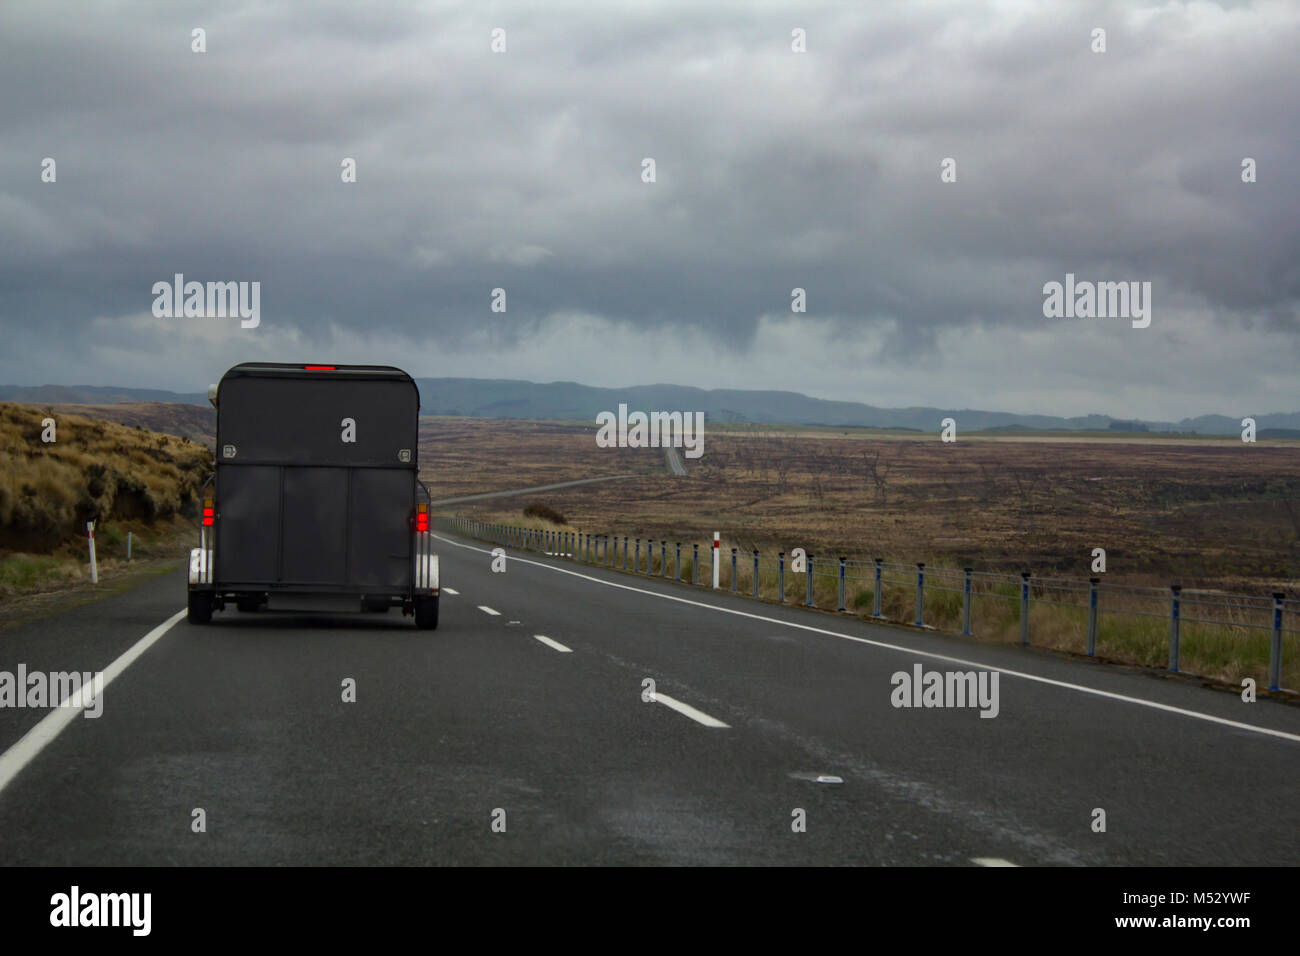 Driving through Beautiful Desert road - Stock Image